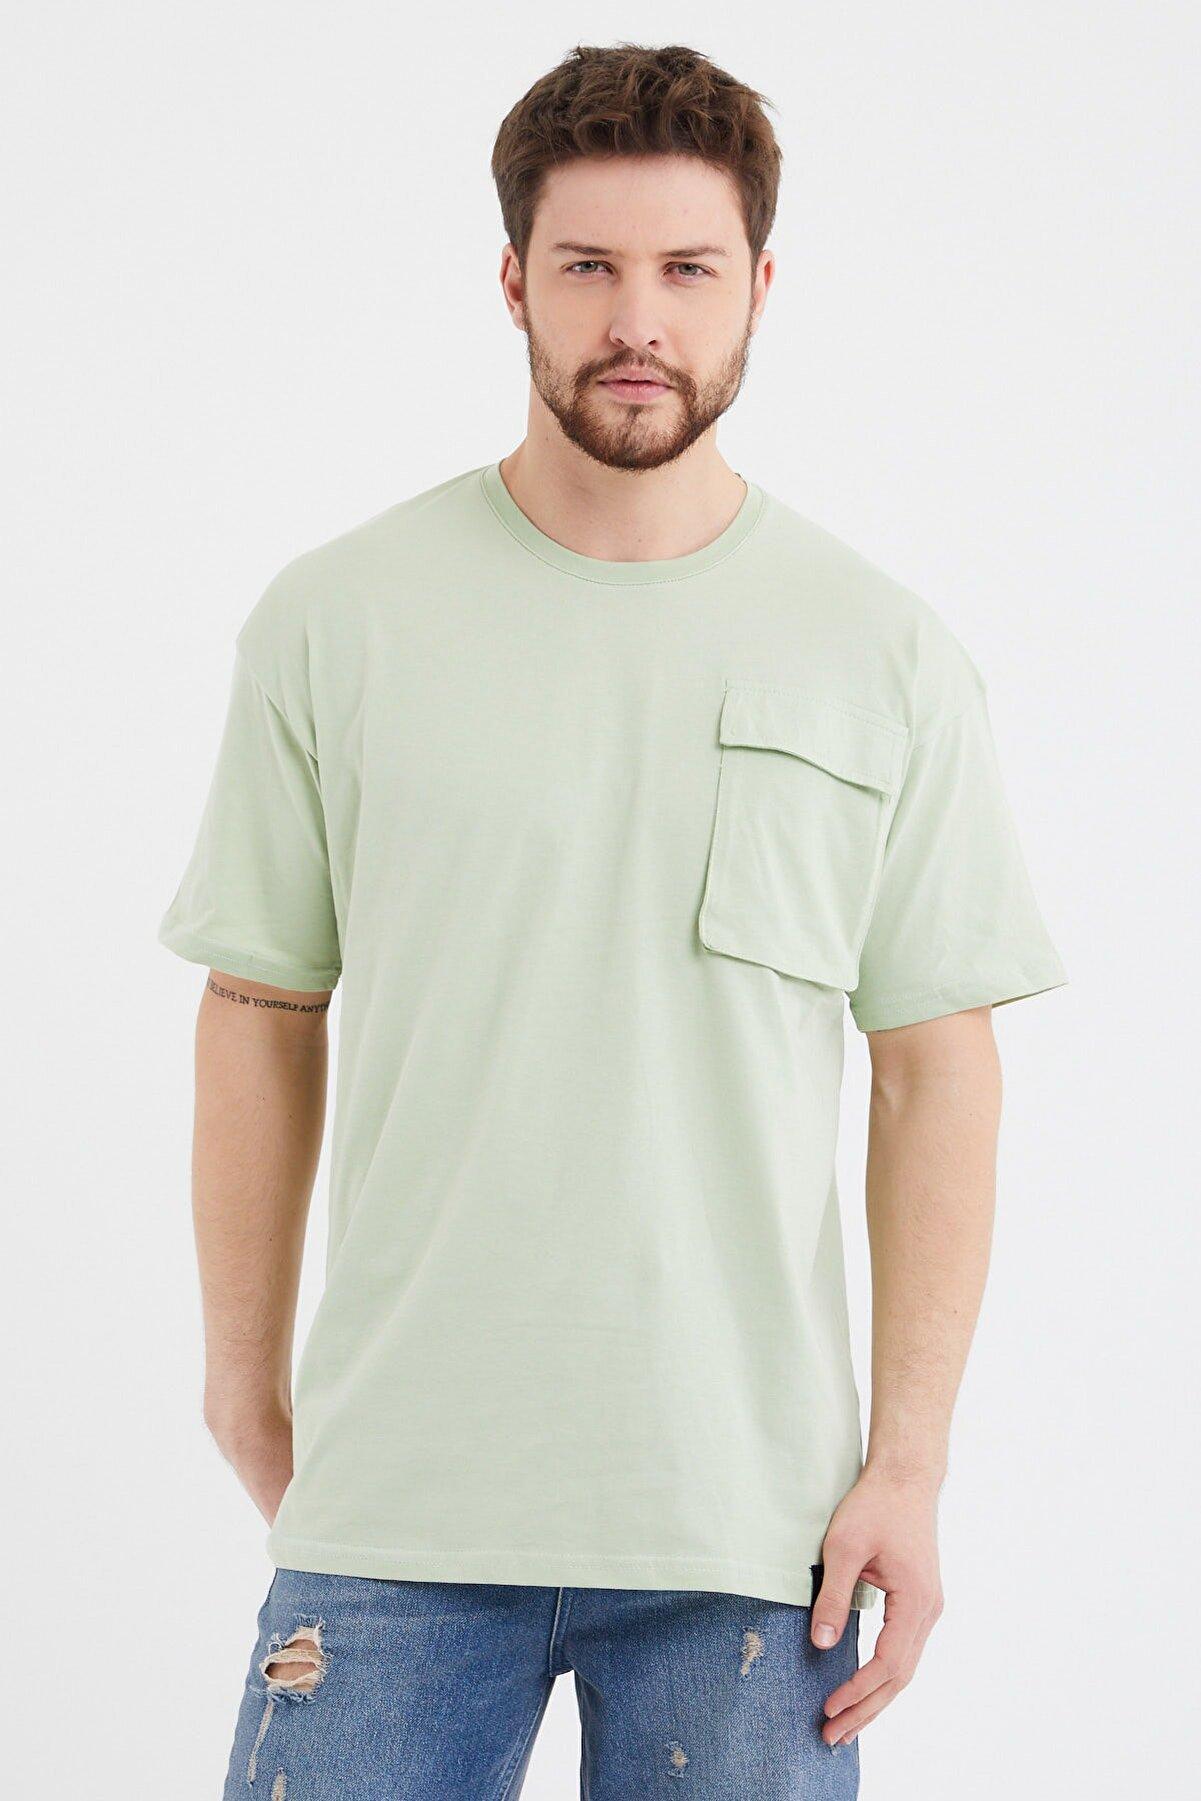 Cocers Erkek Mint Oversize Körük Cepli T-shirt